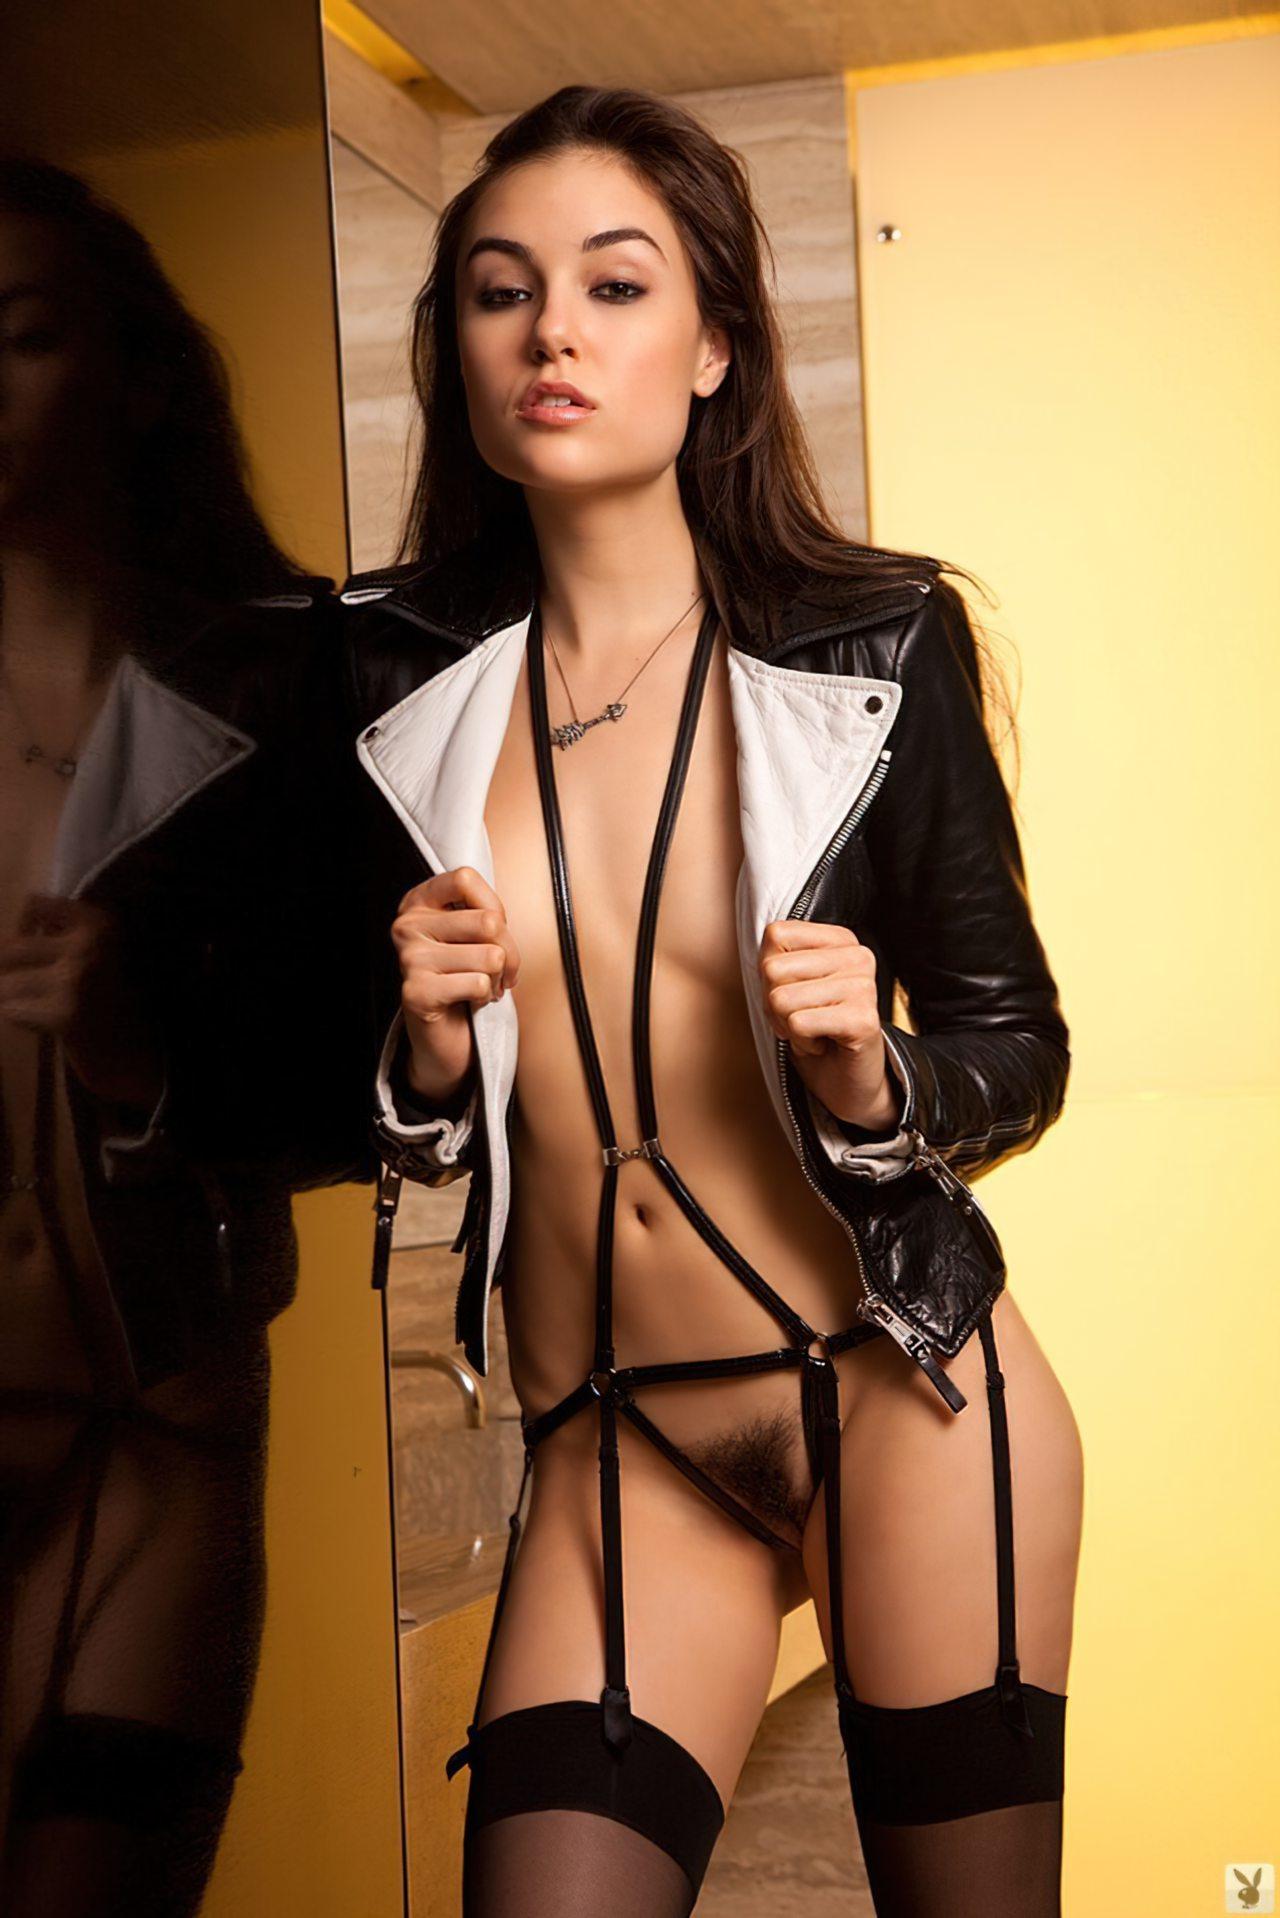 Sasha Grey na Playboy (19)